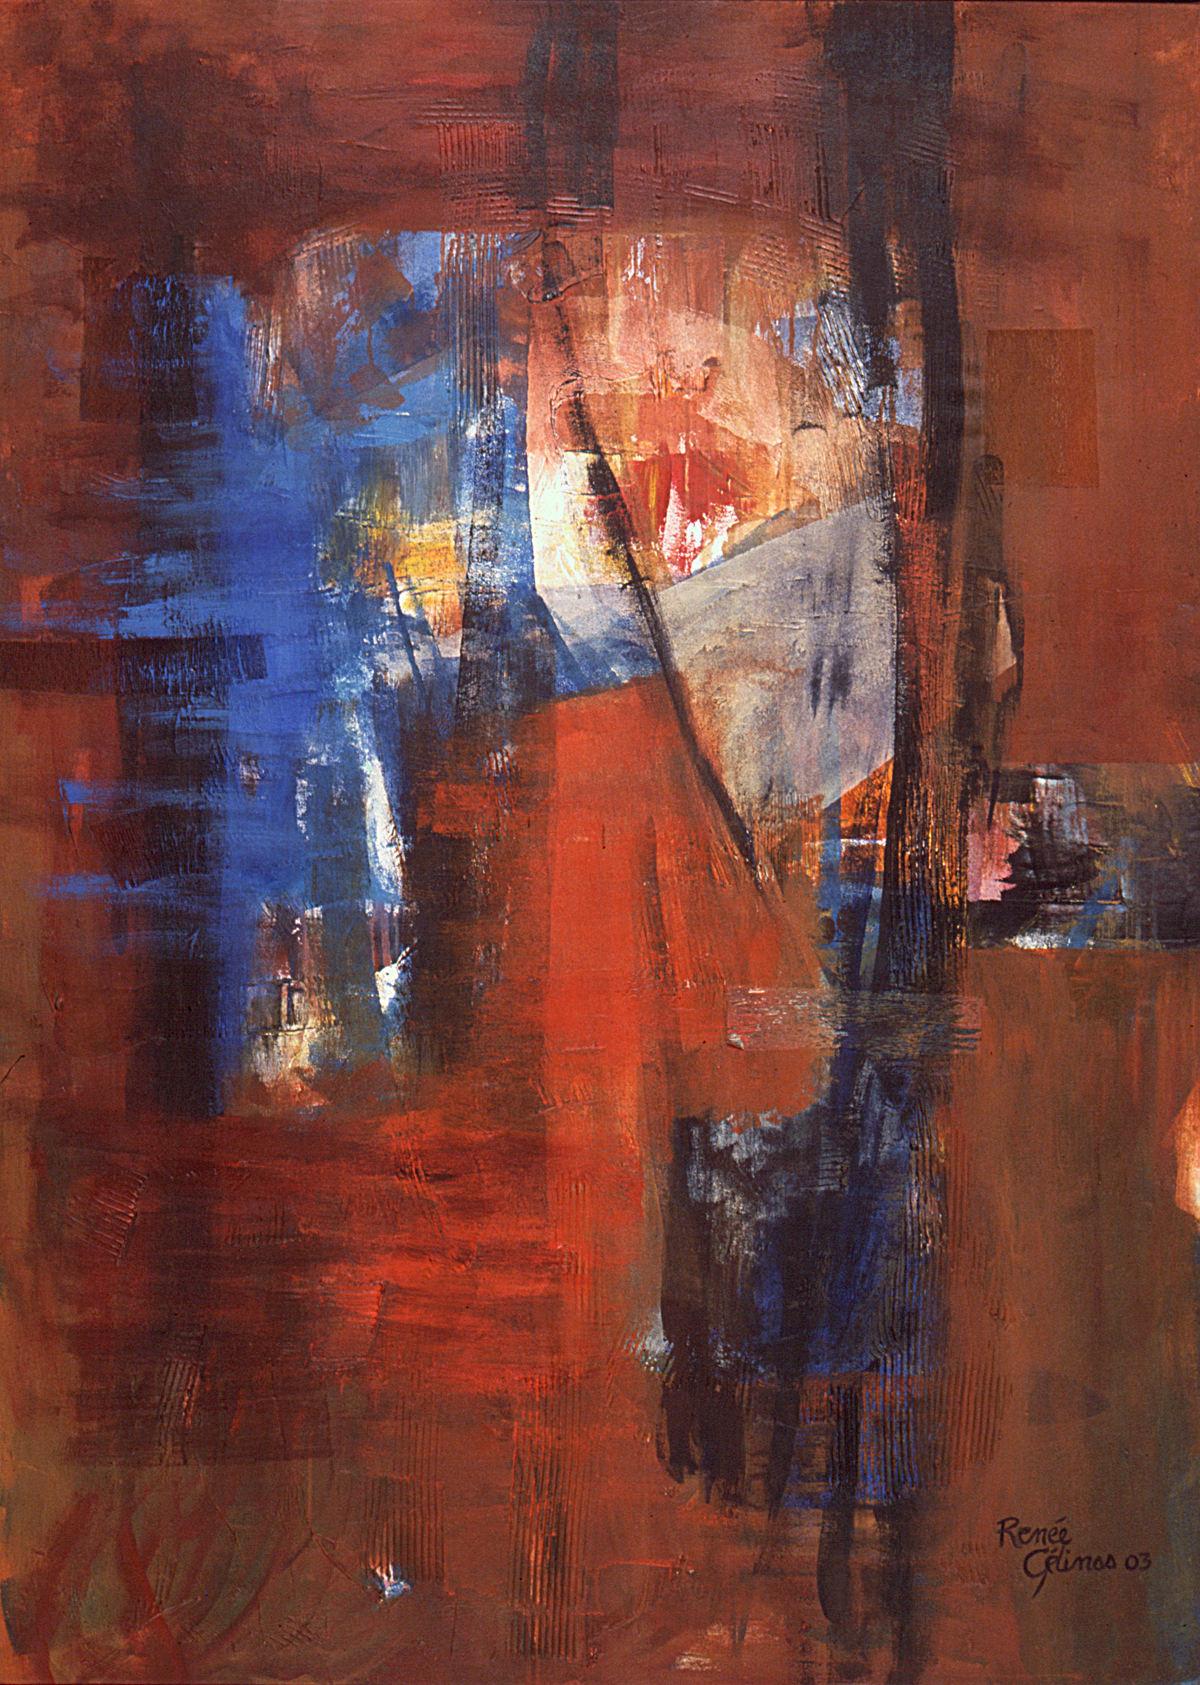 Terre d'ombre, 2003